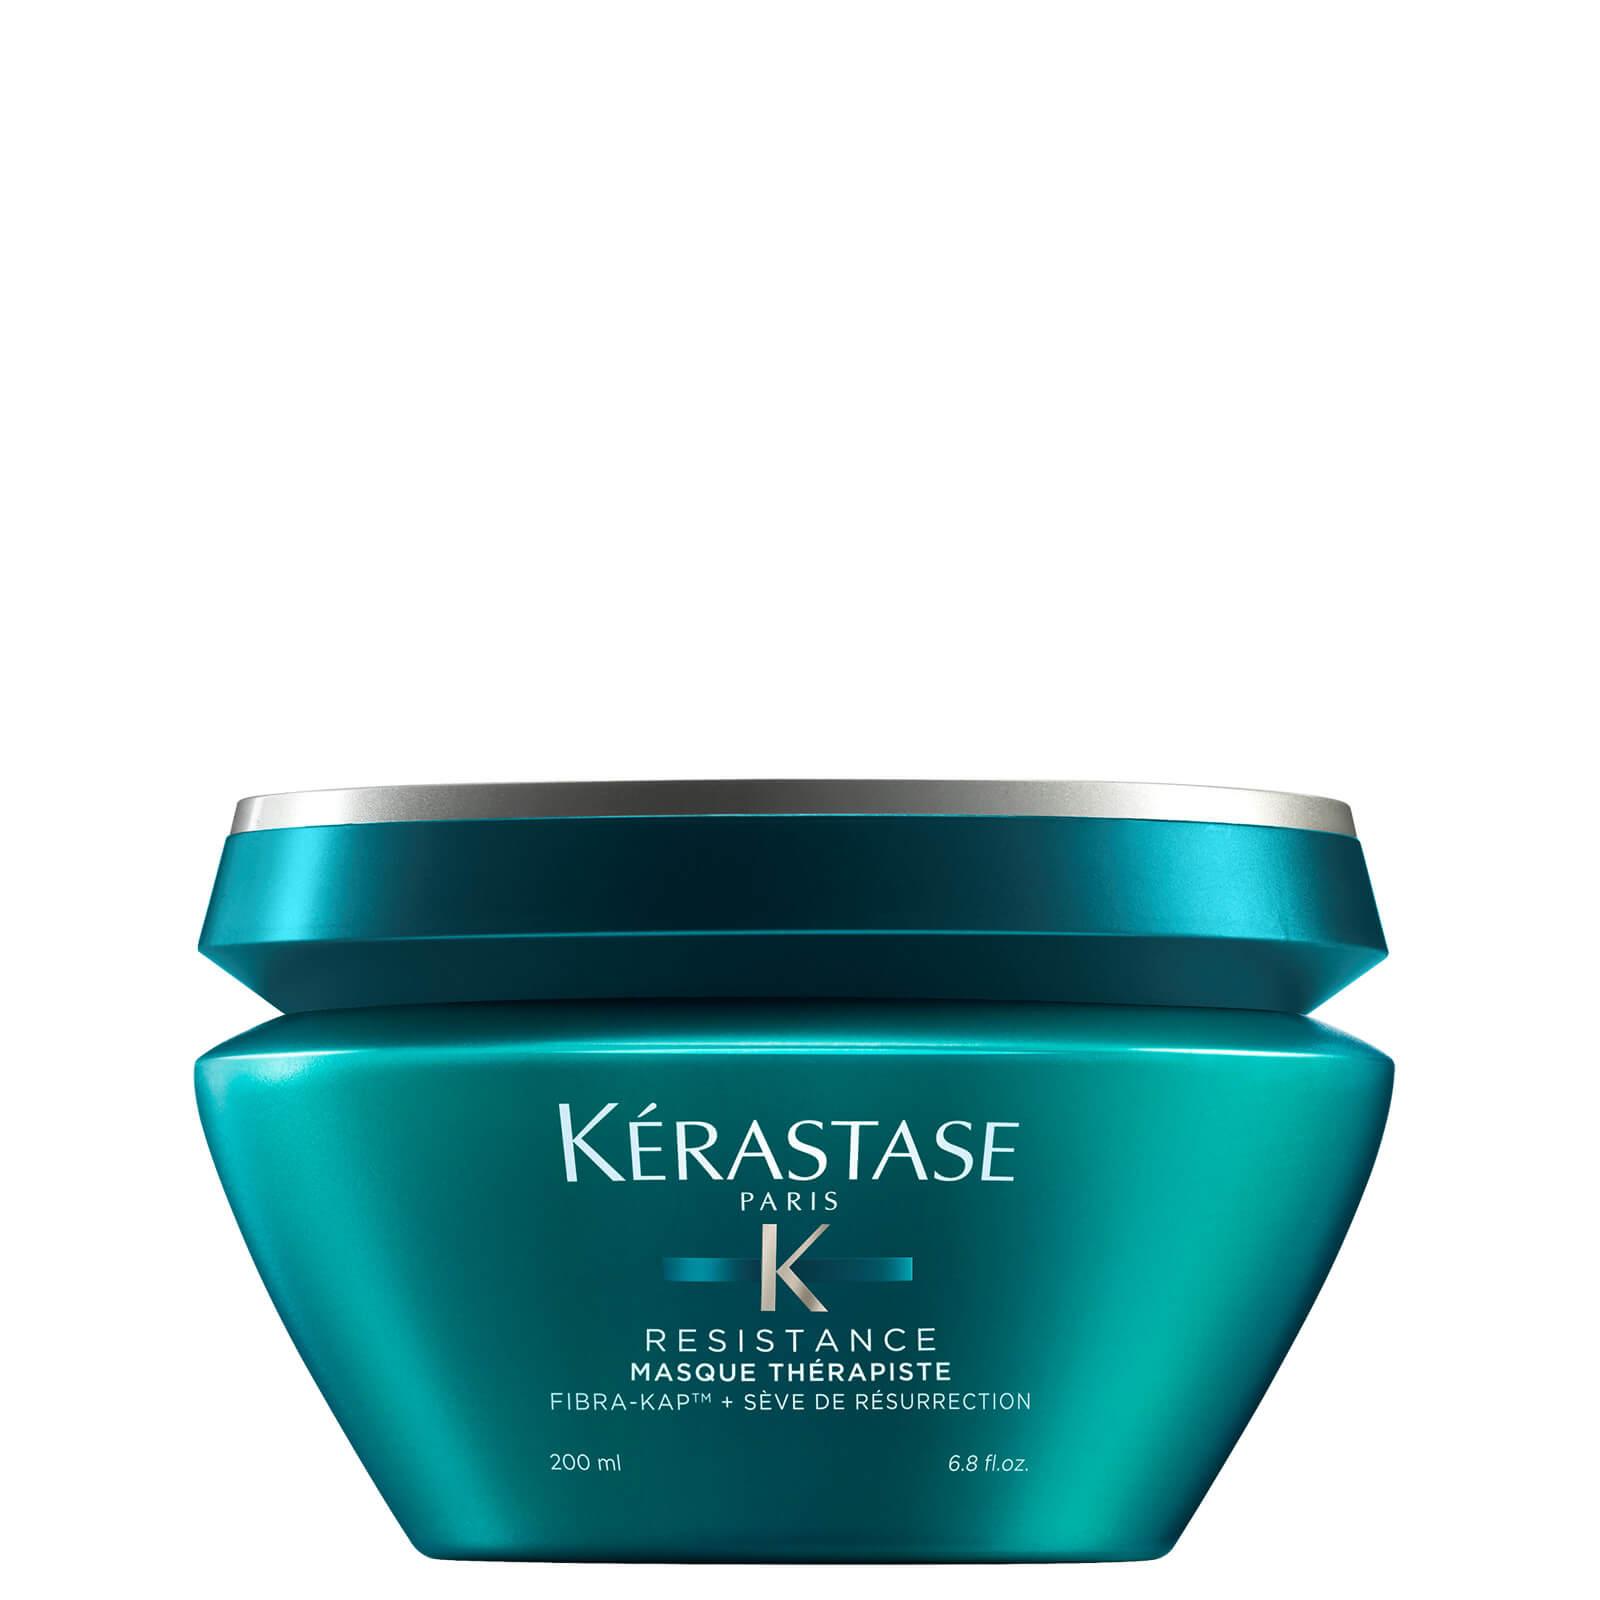 Kerastase Resistance Therapiste Masque (200 ml)